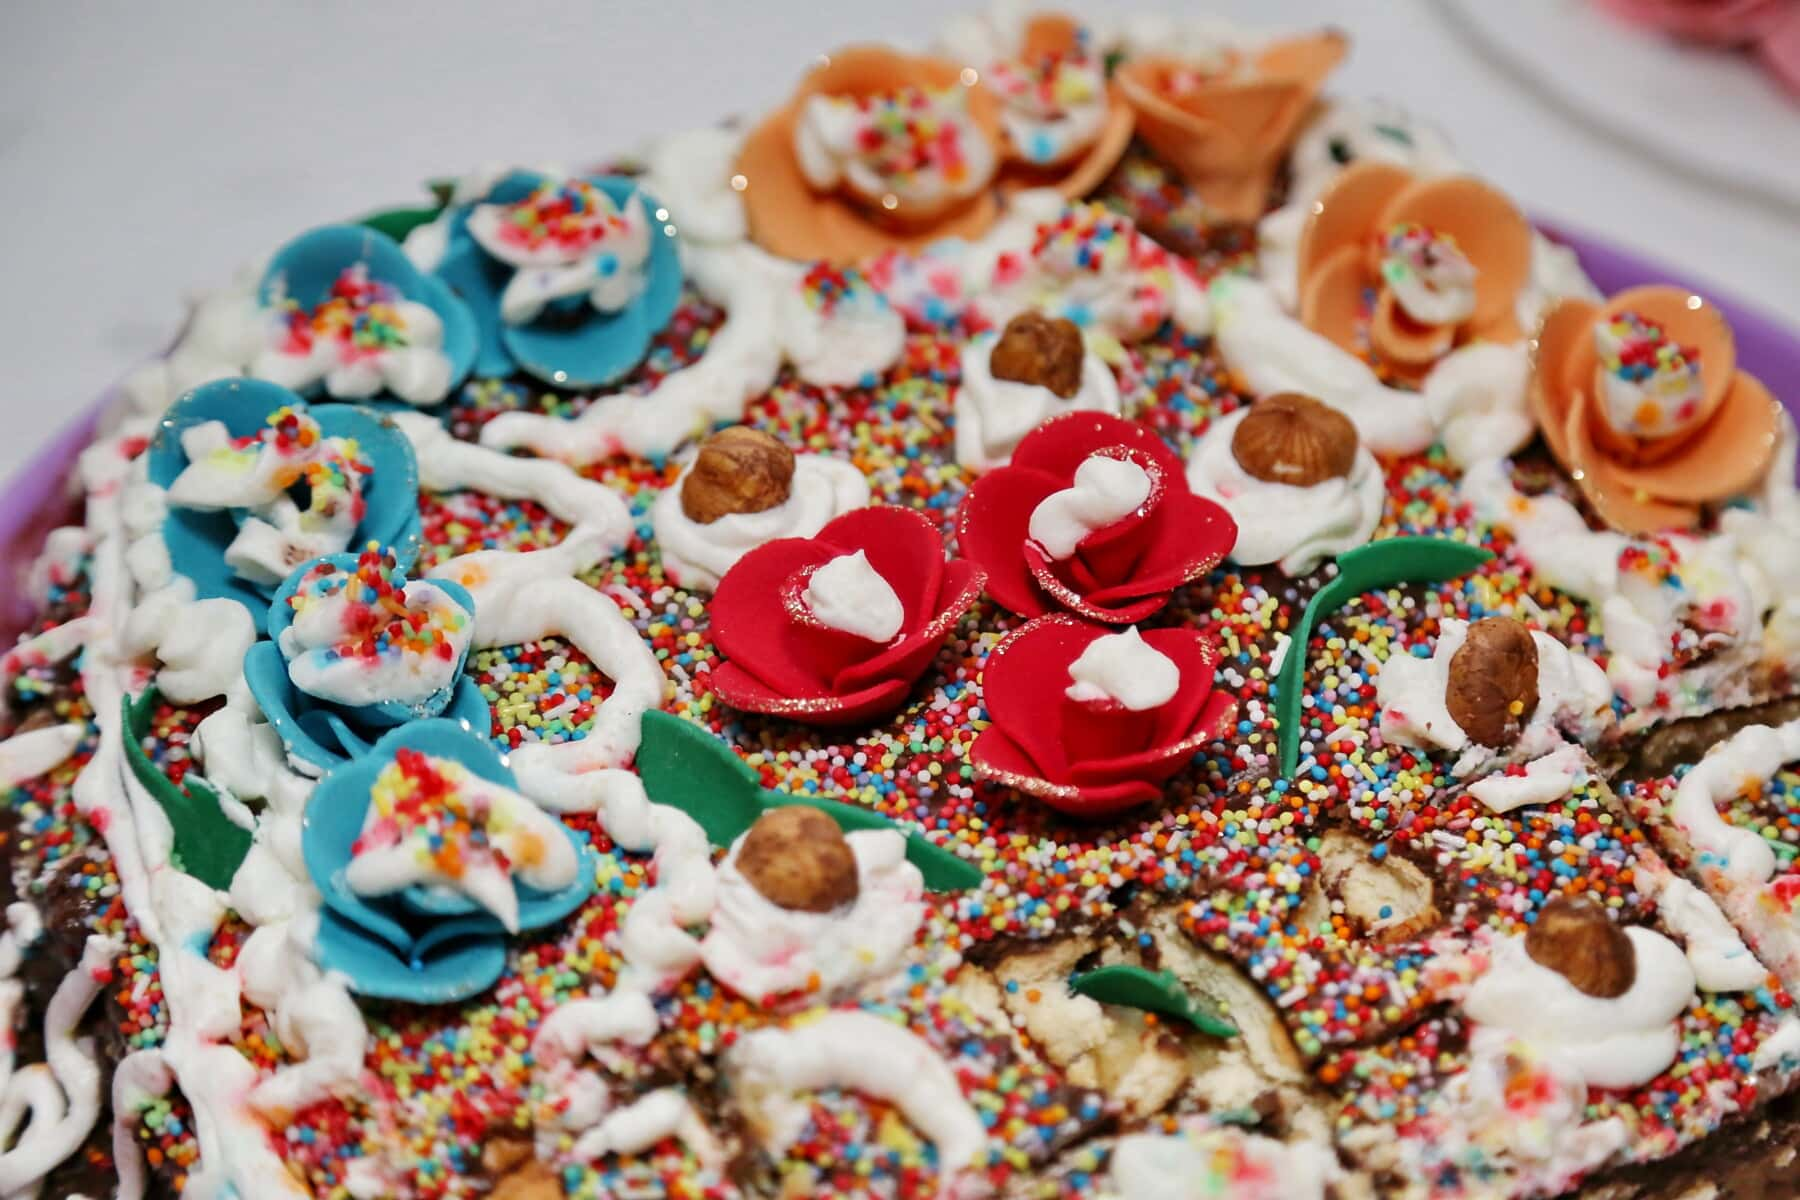 Haselnuss, Kuchen, bunte, Schokolade, Feier, Zucker, Snack, Bonbon, Mahlzeit, süß